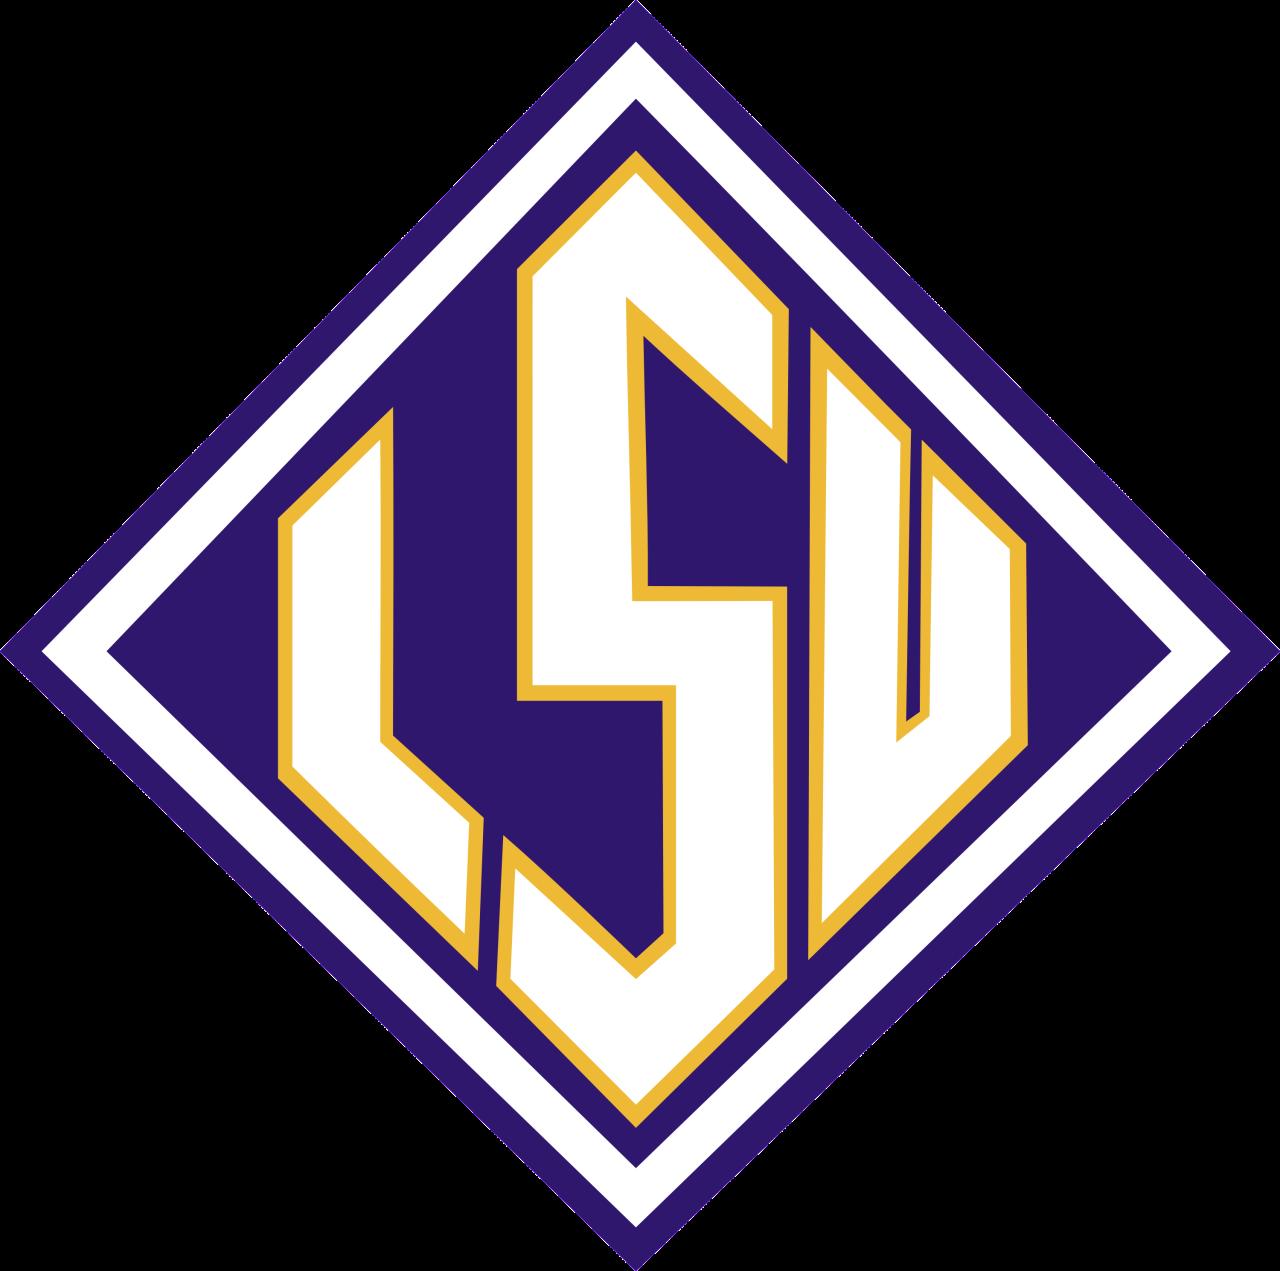 Louisiana clipart lsu tiger. Logo sports logos pinterest